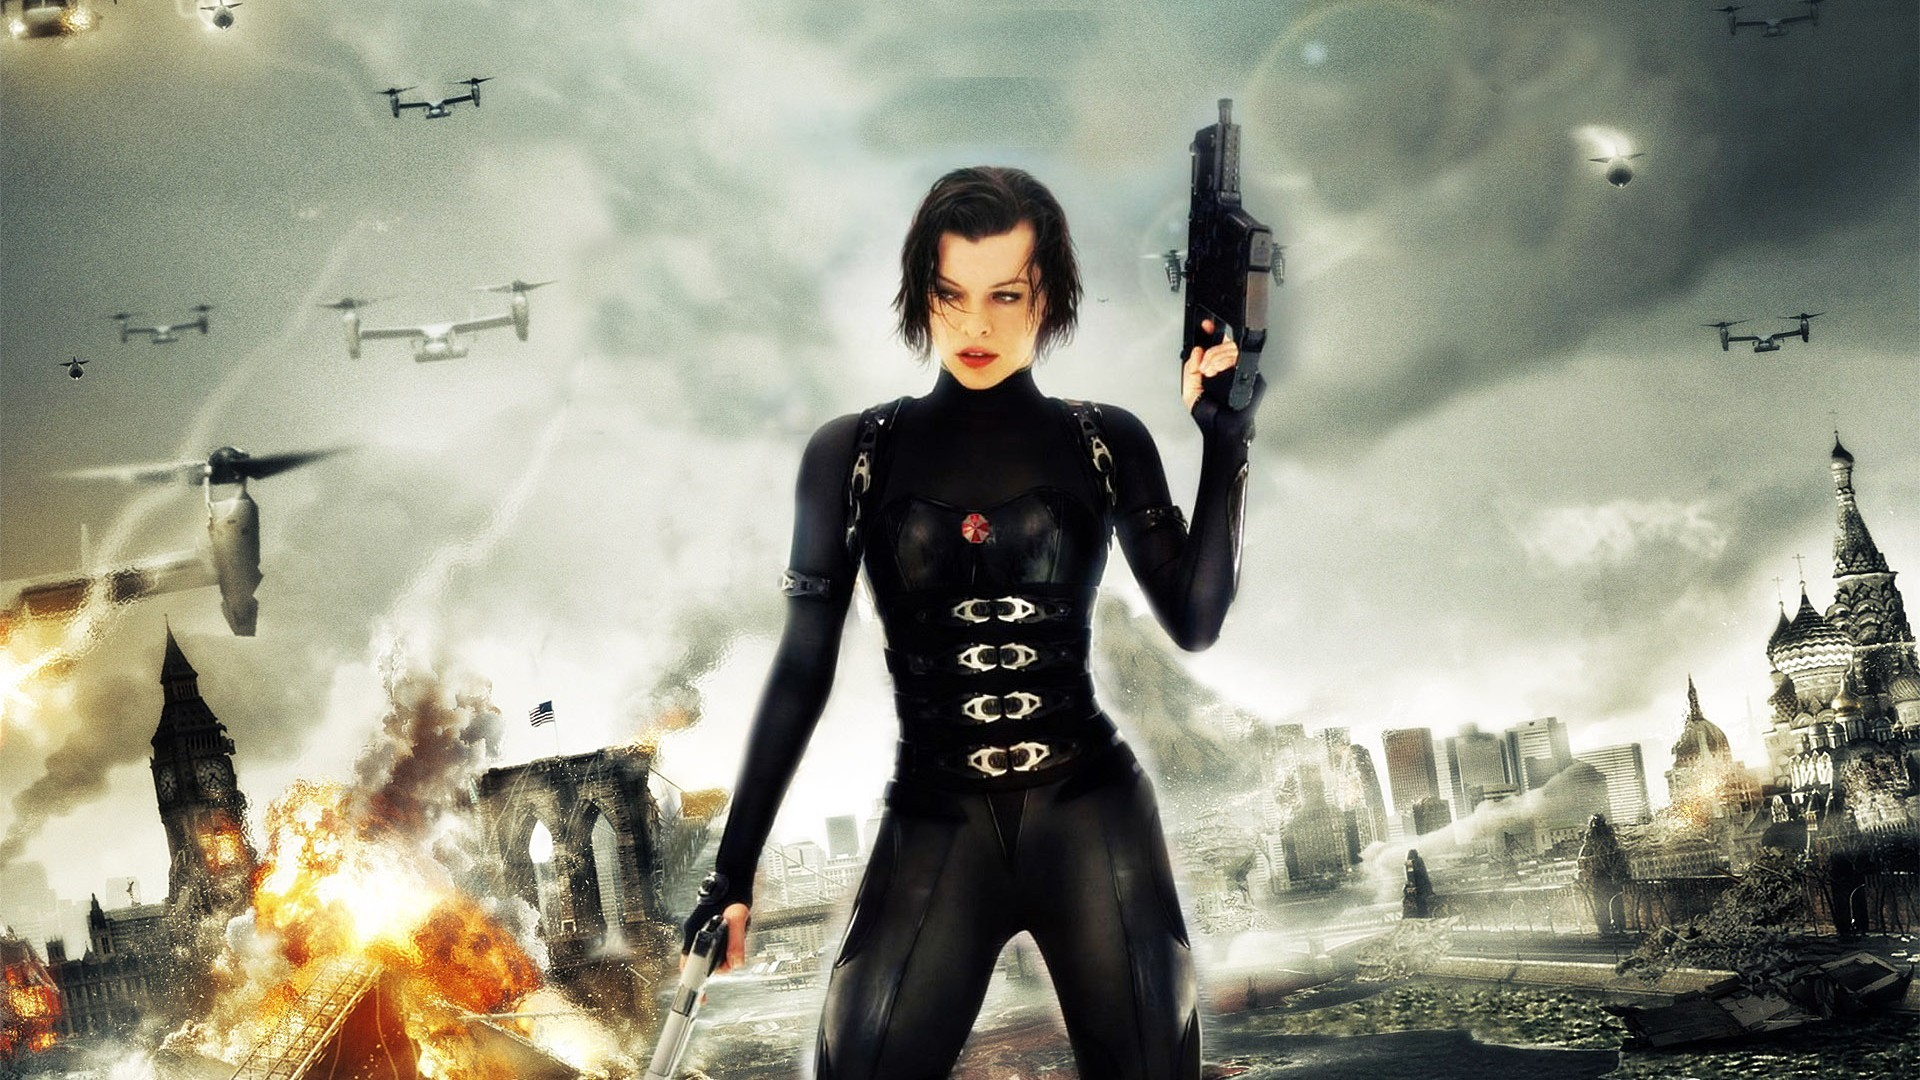 Milla jovovich resident evil wallpaper wallpapertag - Resident evil afterlife wallpaper ...